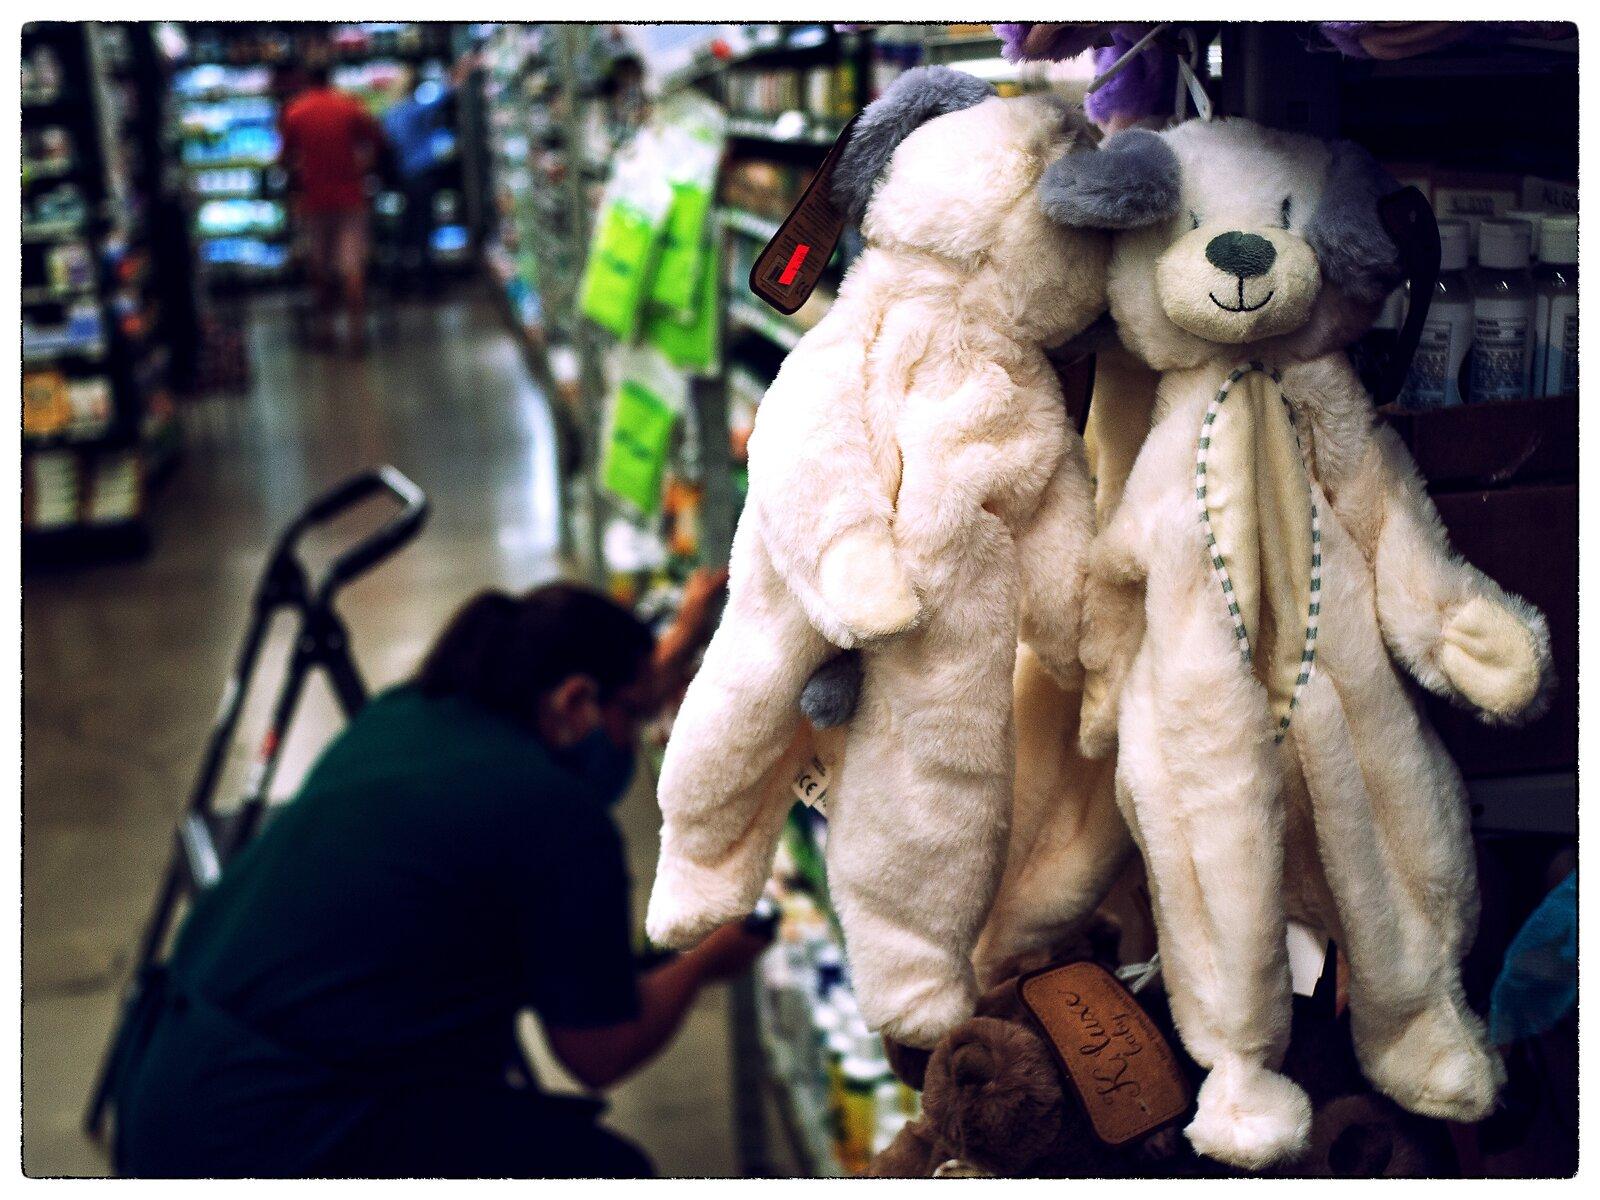 EP3_Aug13_Supermarket_animals(ColorEfexXP).jpg